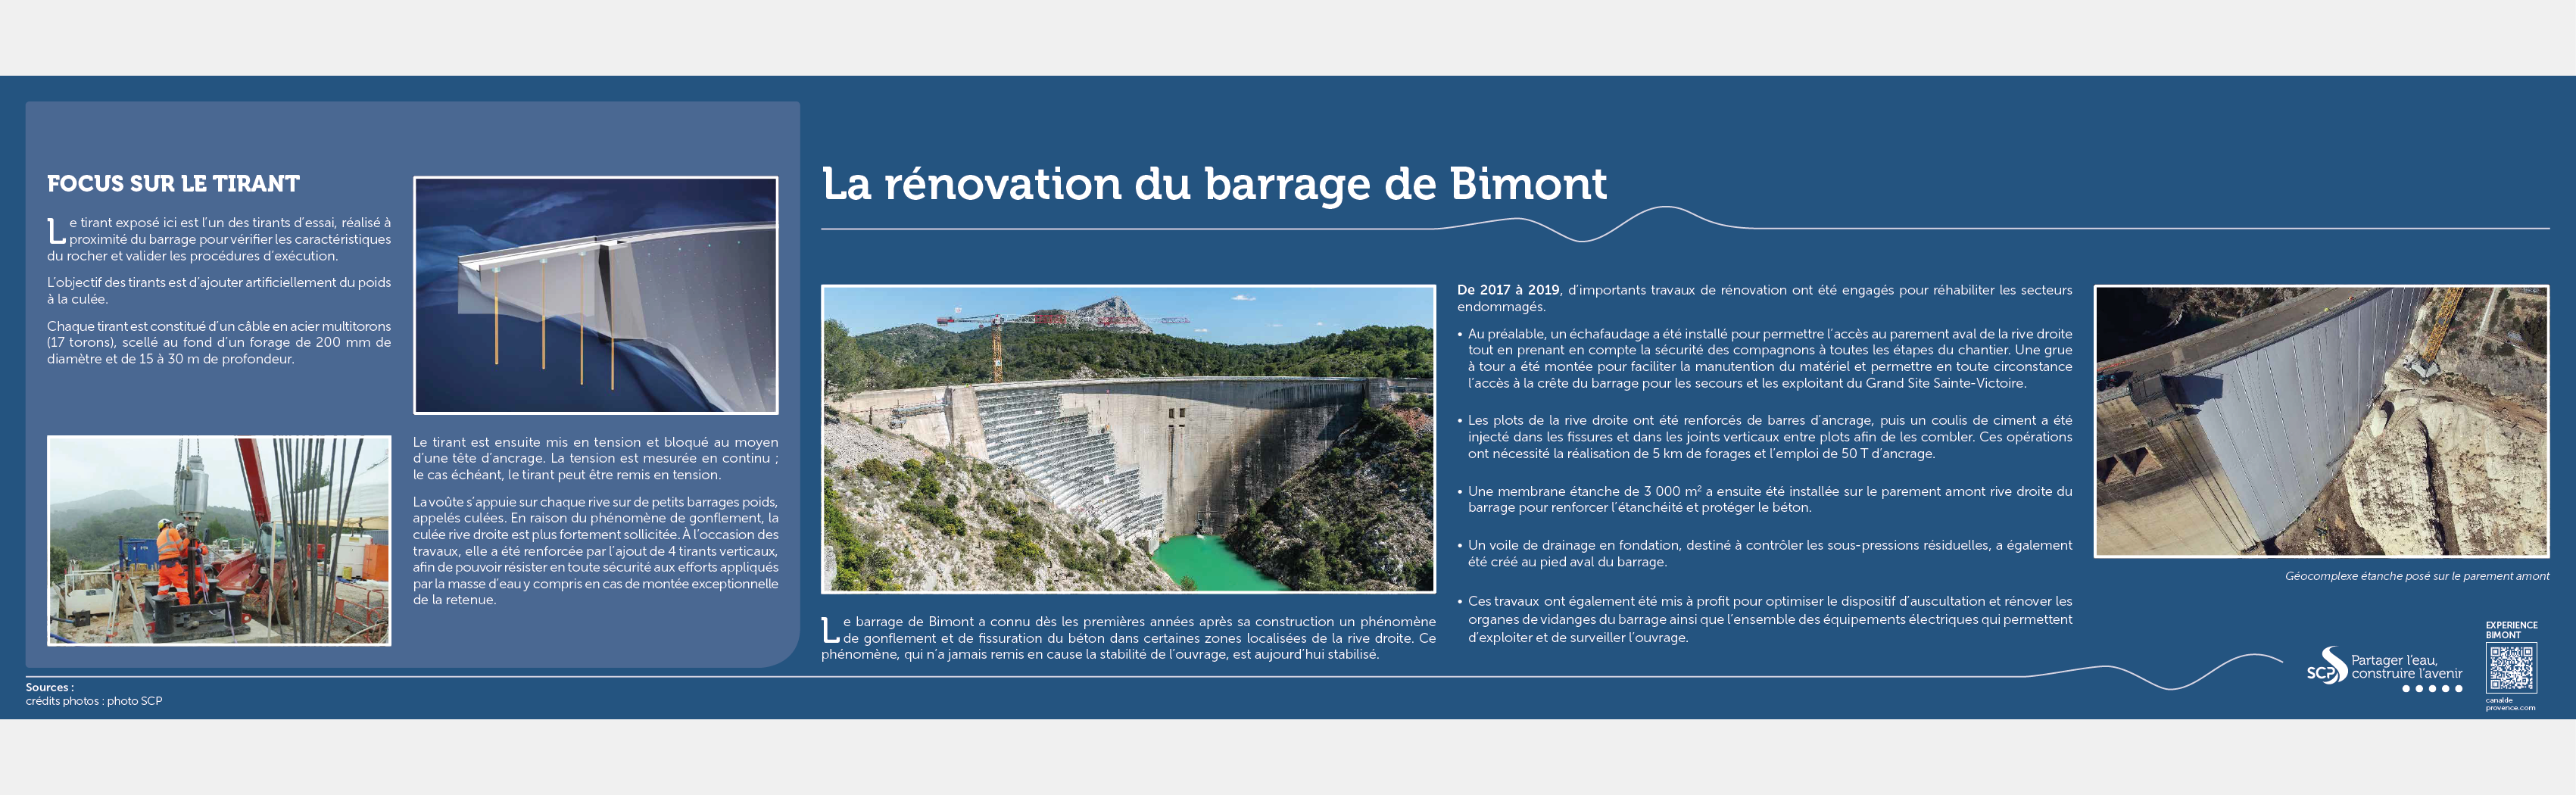 charte-bimont8